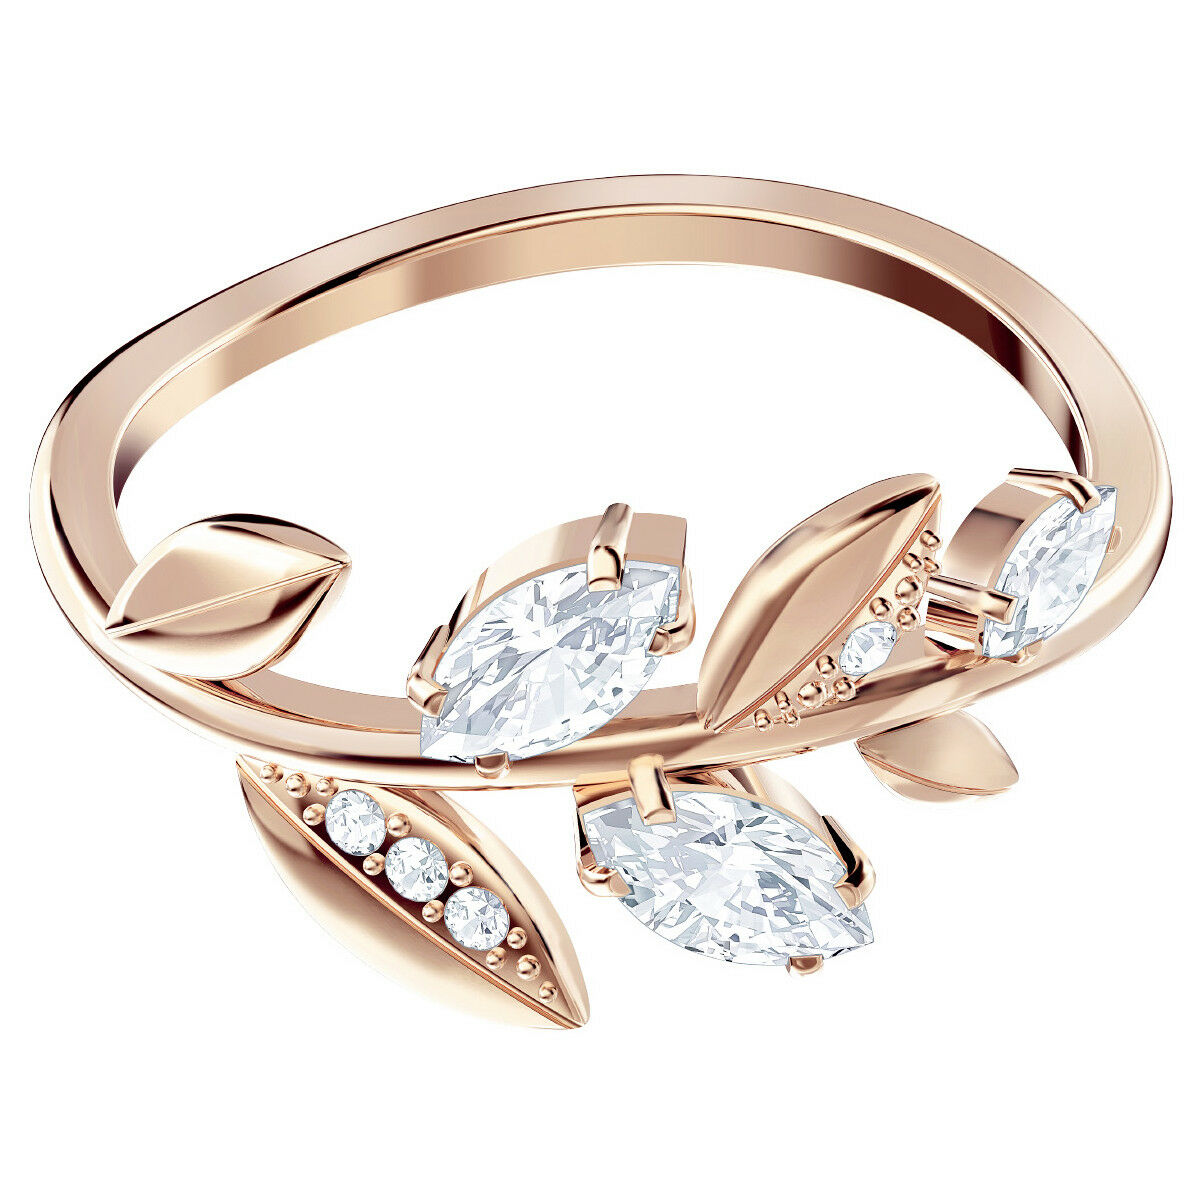 MAYFLY RING WHITE pink gold PLATING SIZE 9 SWAROVSKI JEWELRY 5448886